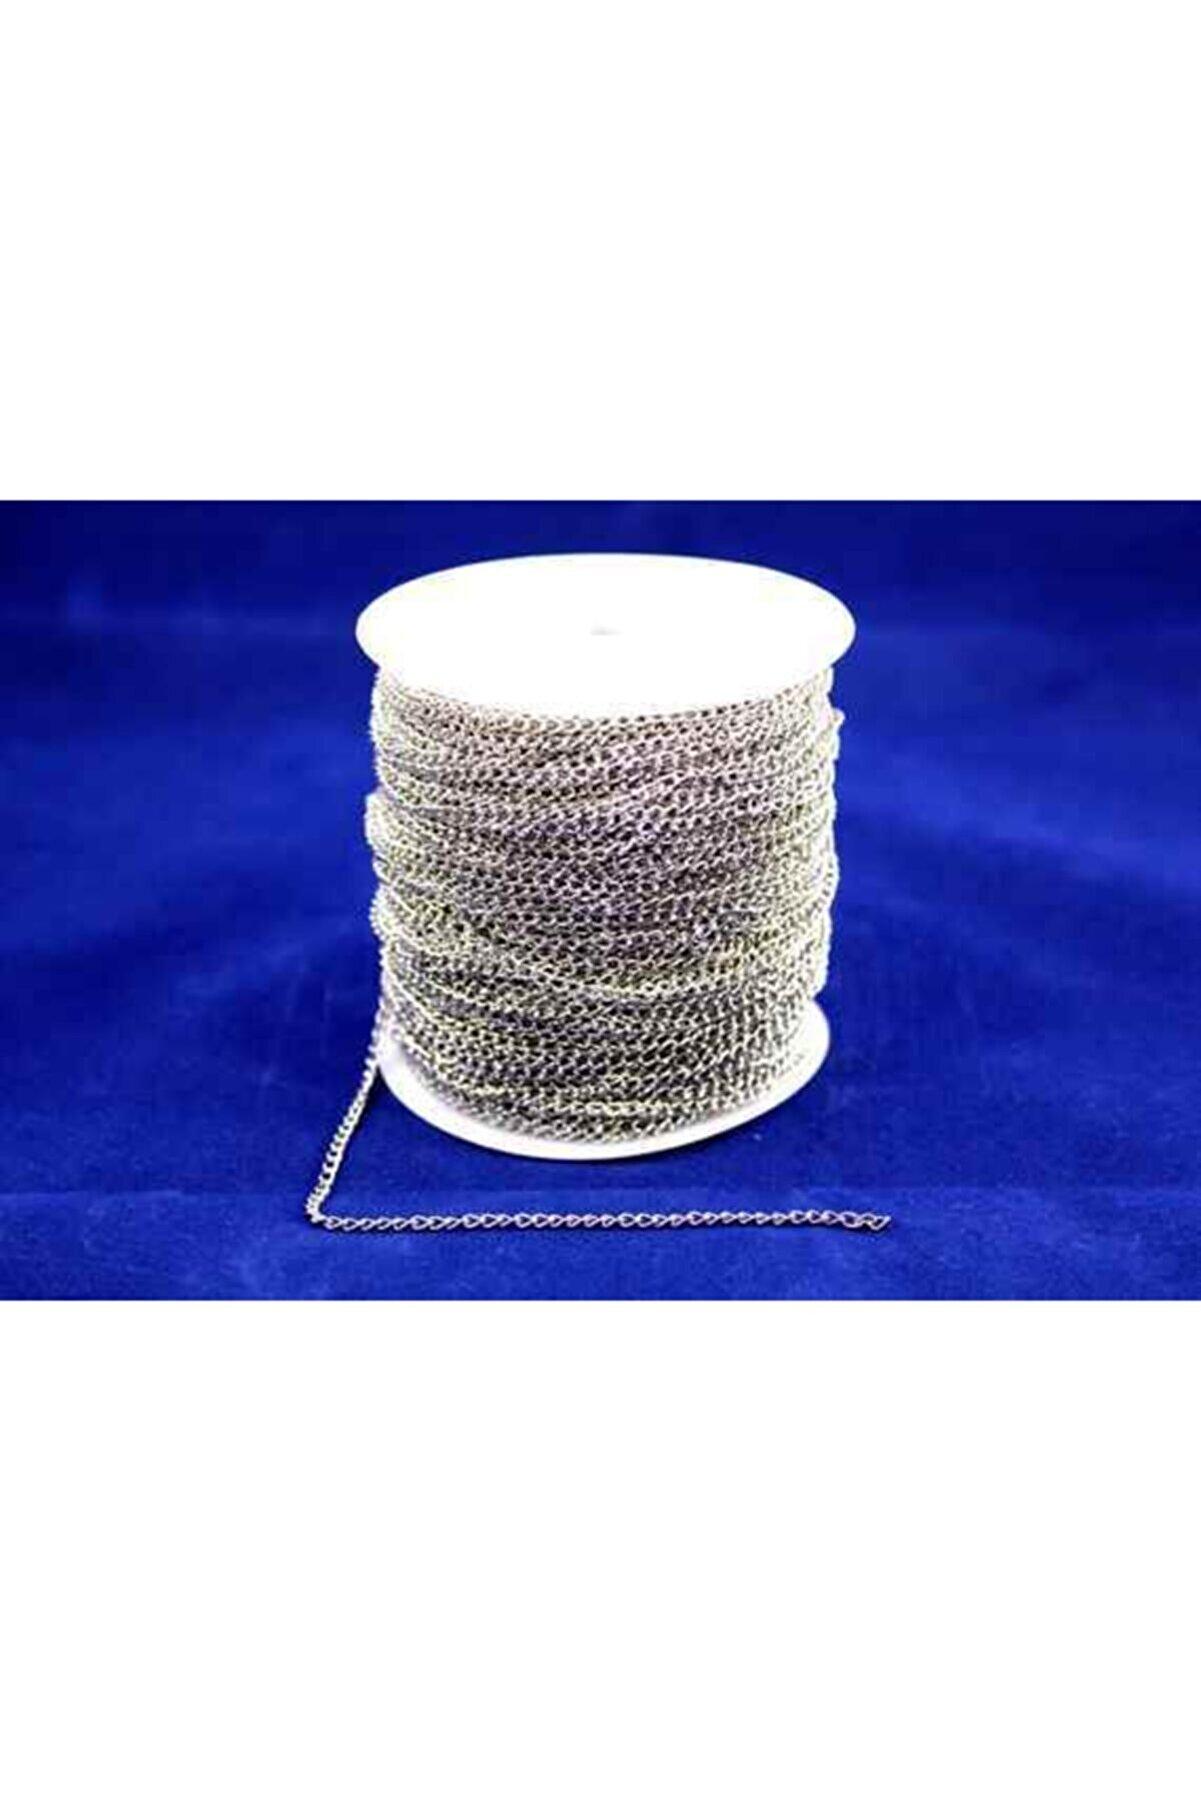 Ertürk Metal Aksesuar 0.60 Mm Free Nikel Sac Kıvrık Zincir 10 Metre